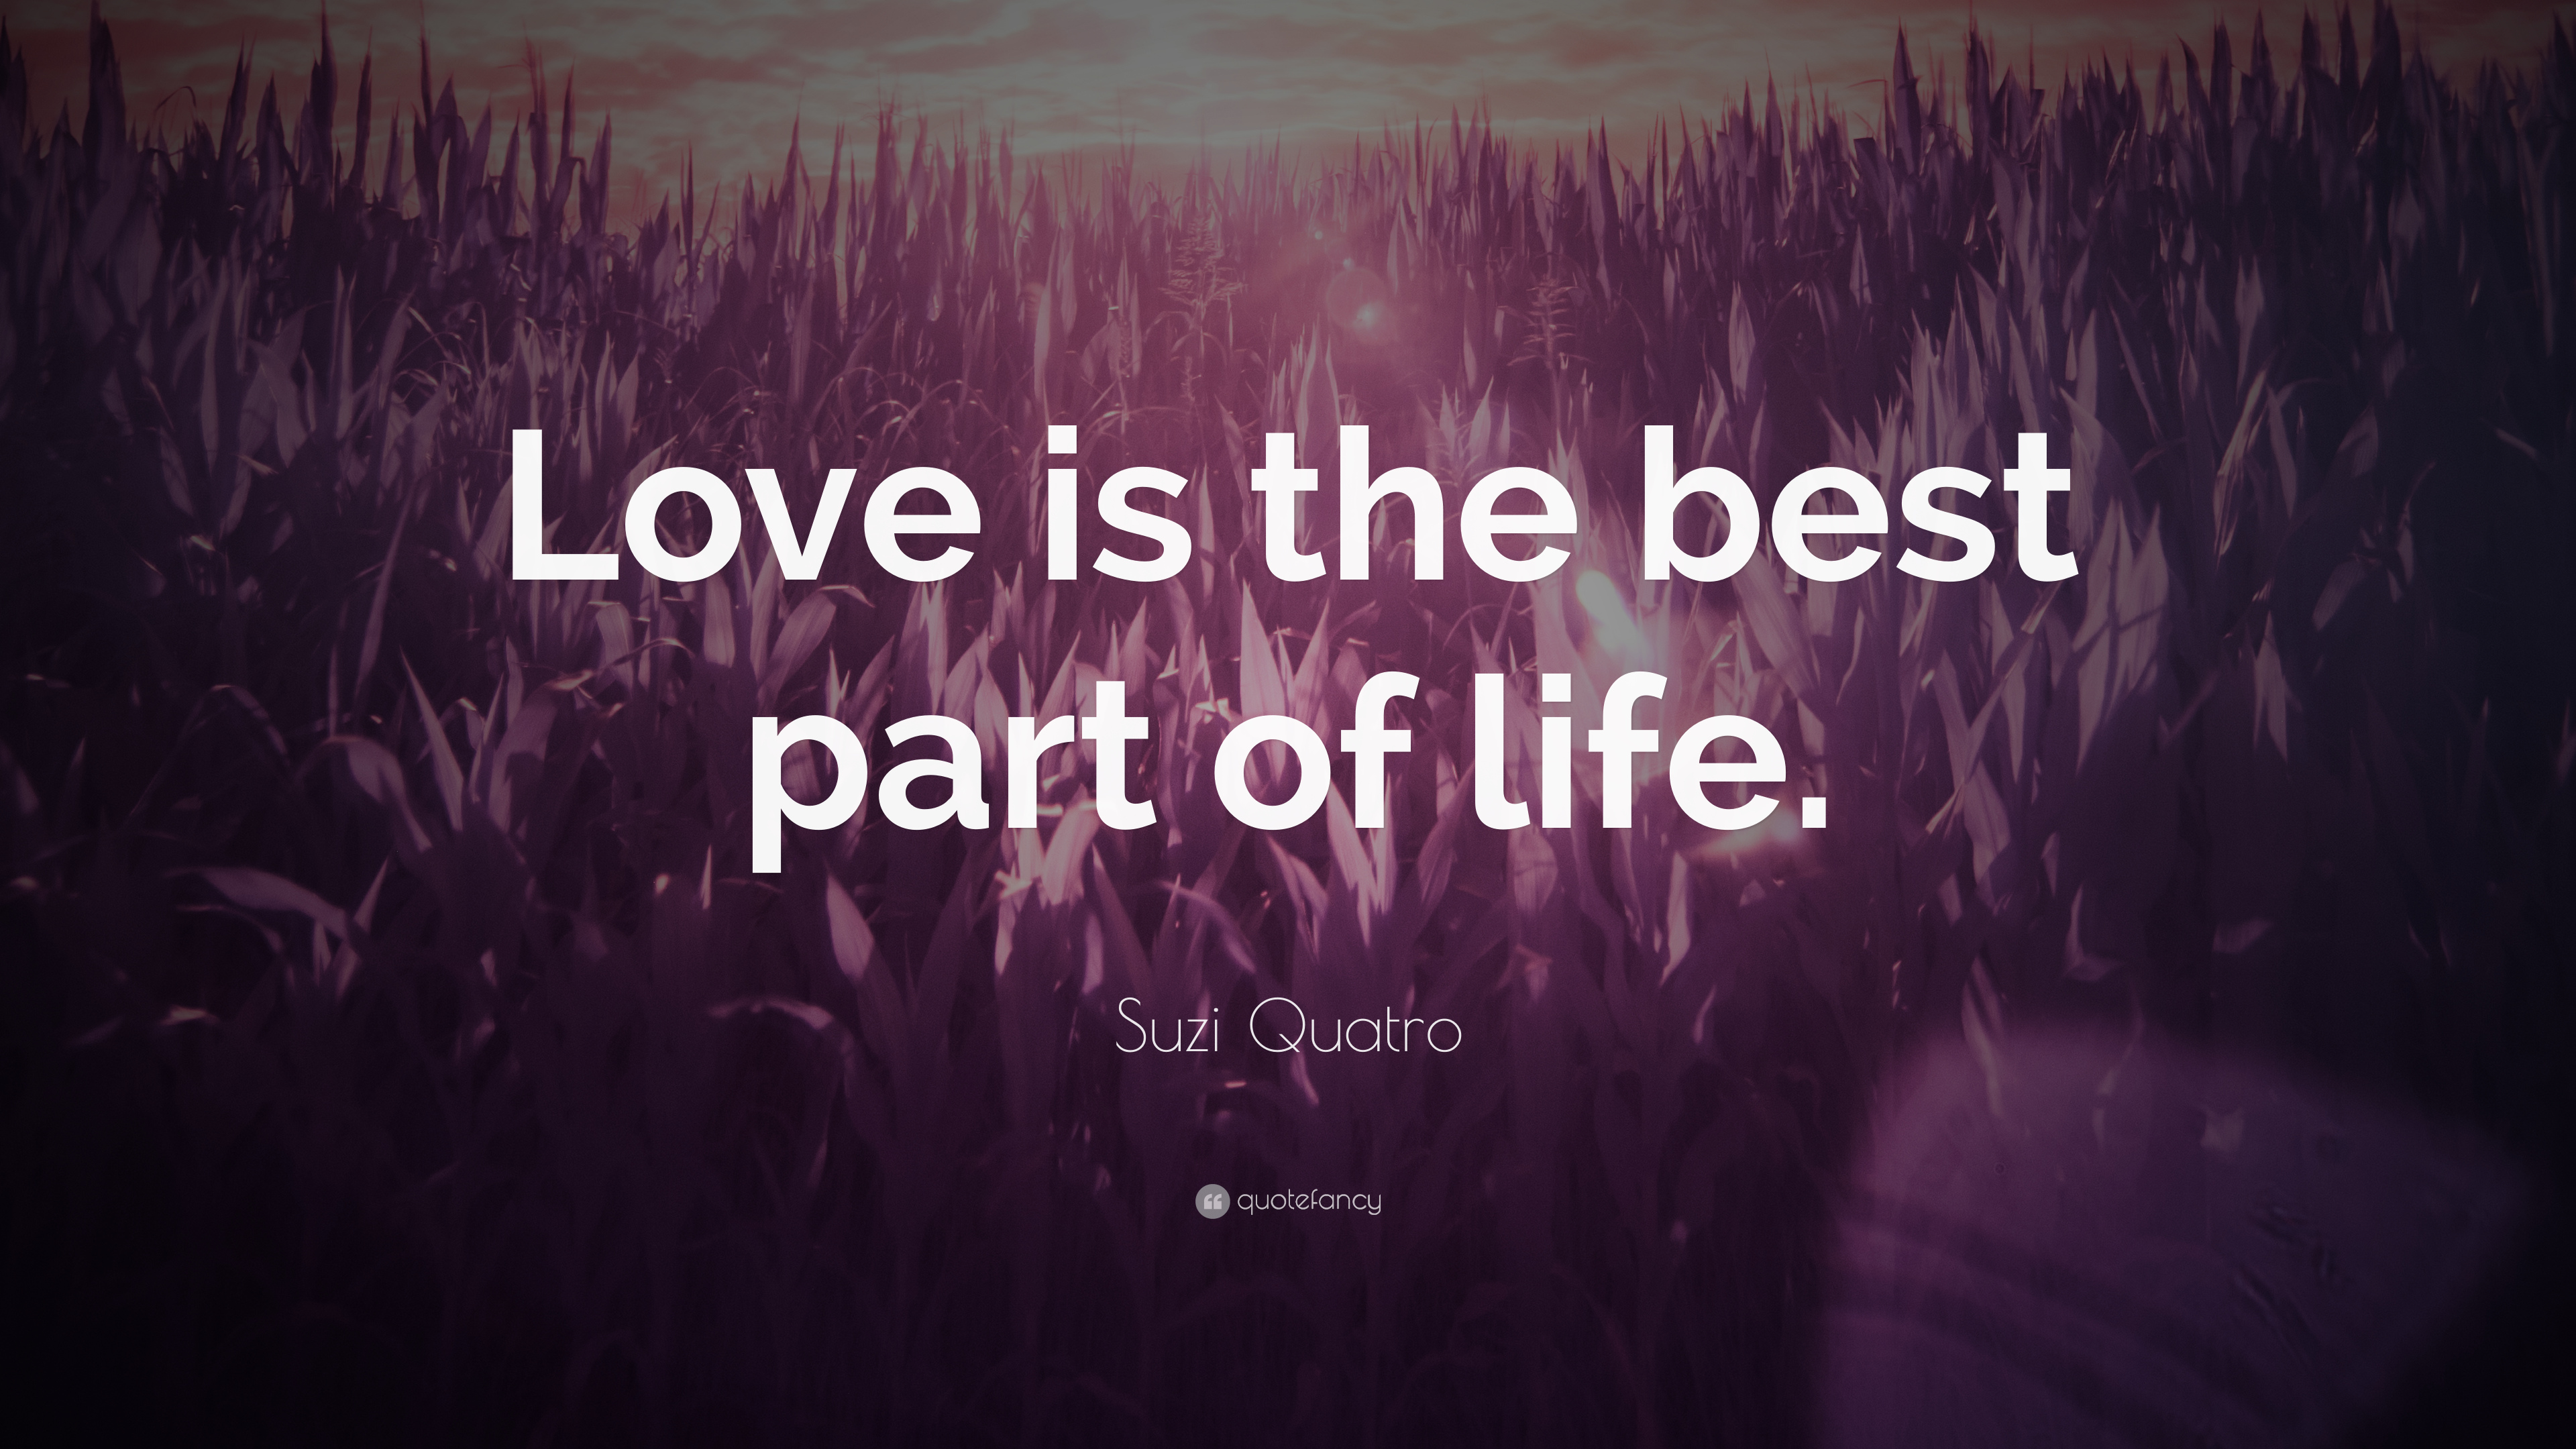 Suzi Quatro Quote Love Is The Best Part Of Life 7 Wallpapers